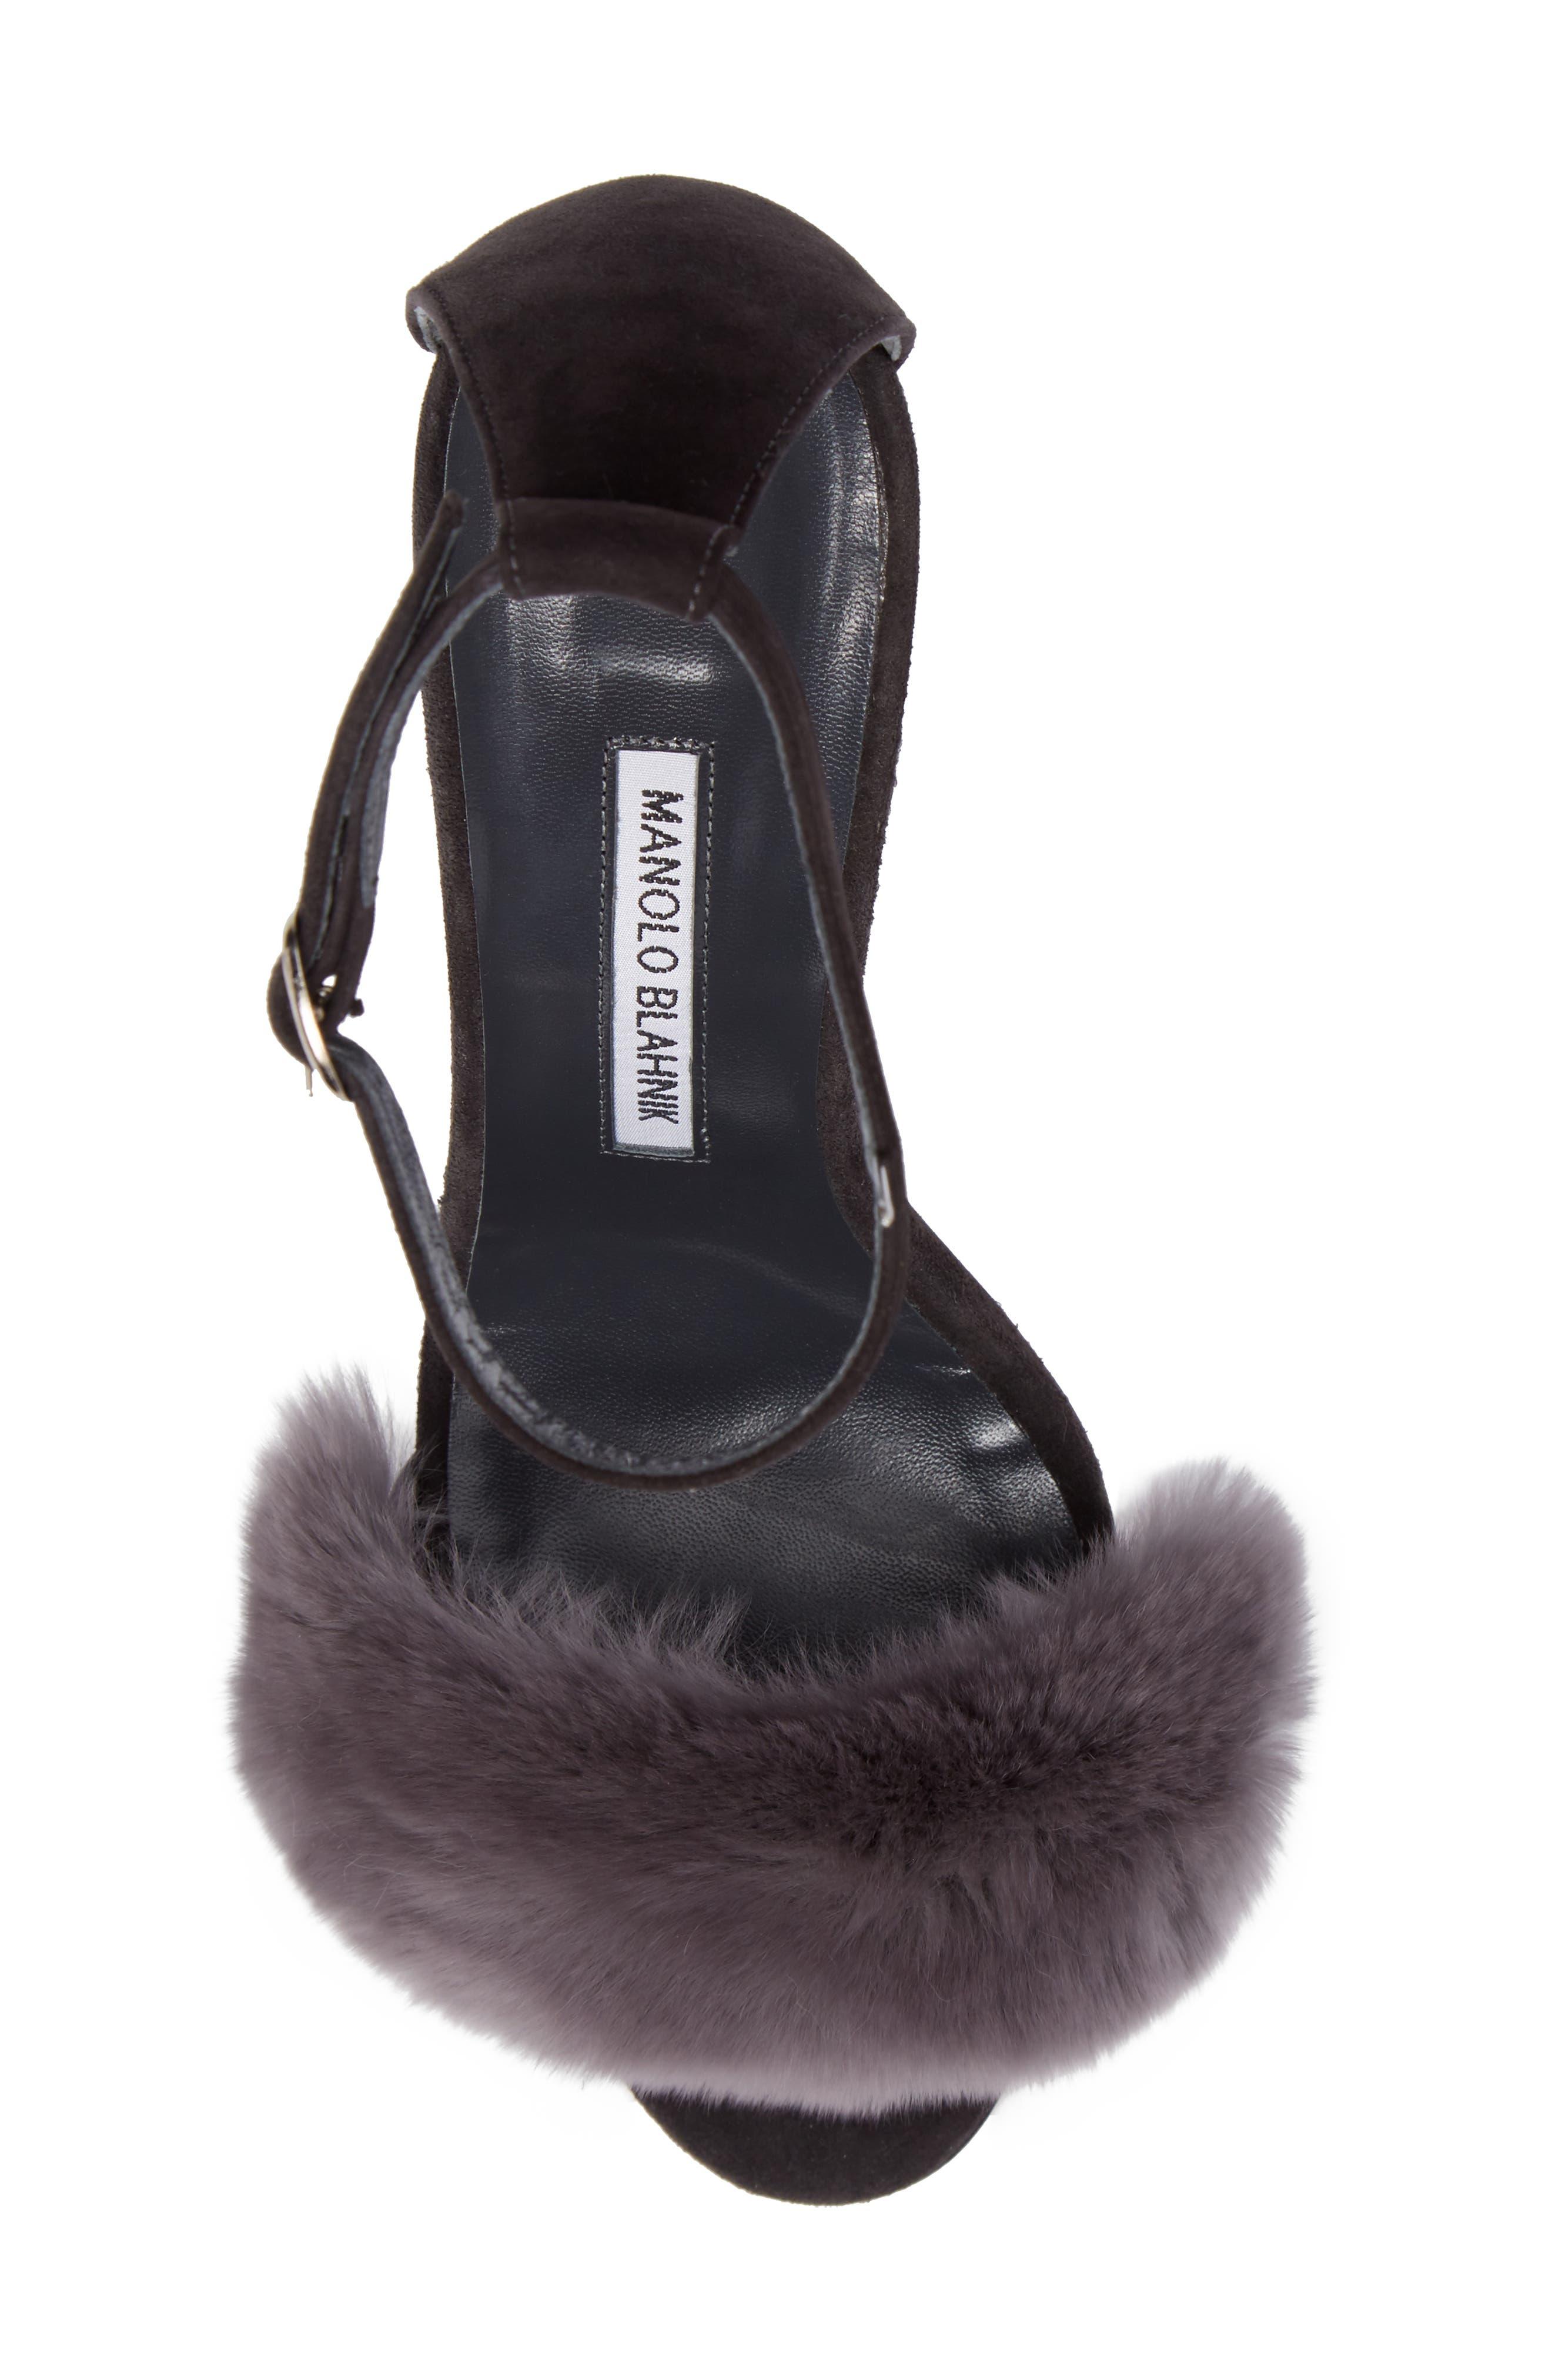 Mincha Genuine Rabbit Fur Sandal,                             Alternate thumbnail 5, color,                             035